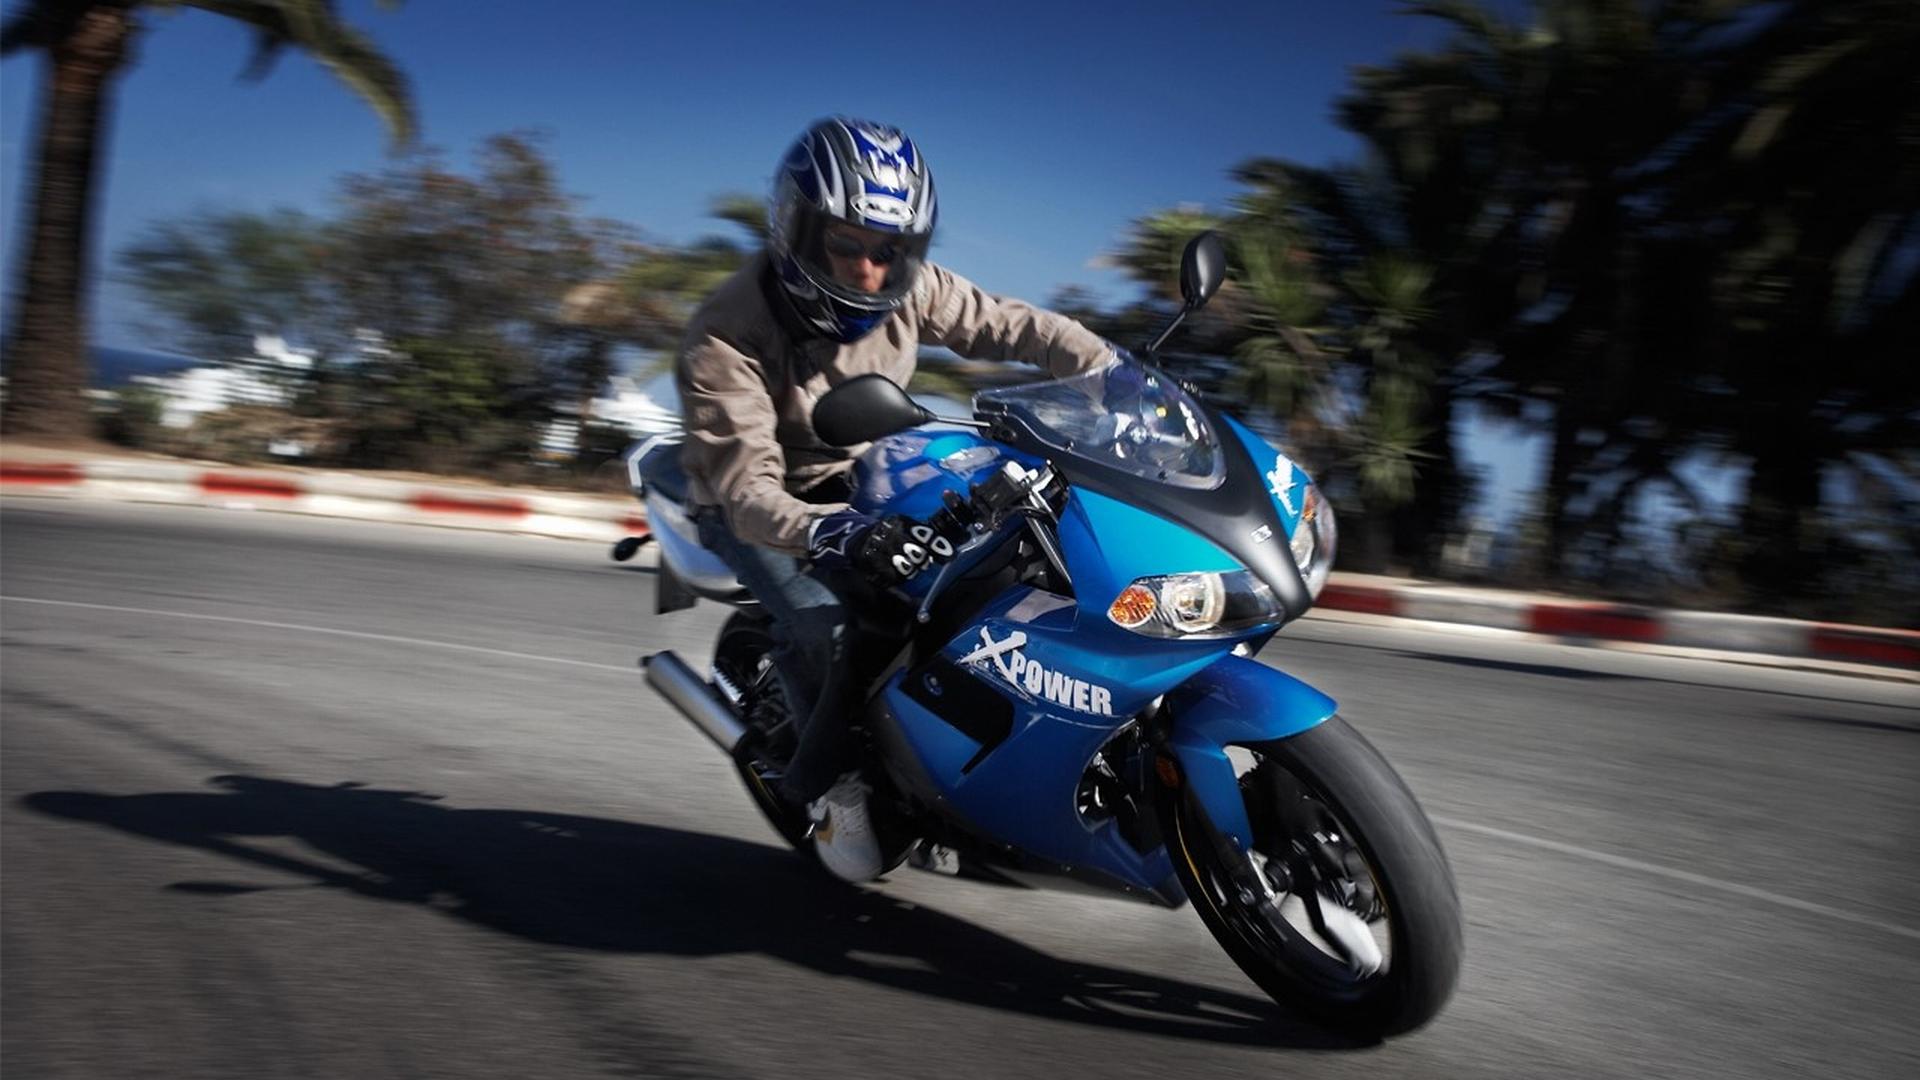 Vehicles Motorcycle Wallpapers Girls Backgrounds Hd Desktop Bike 1920x1080